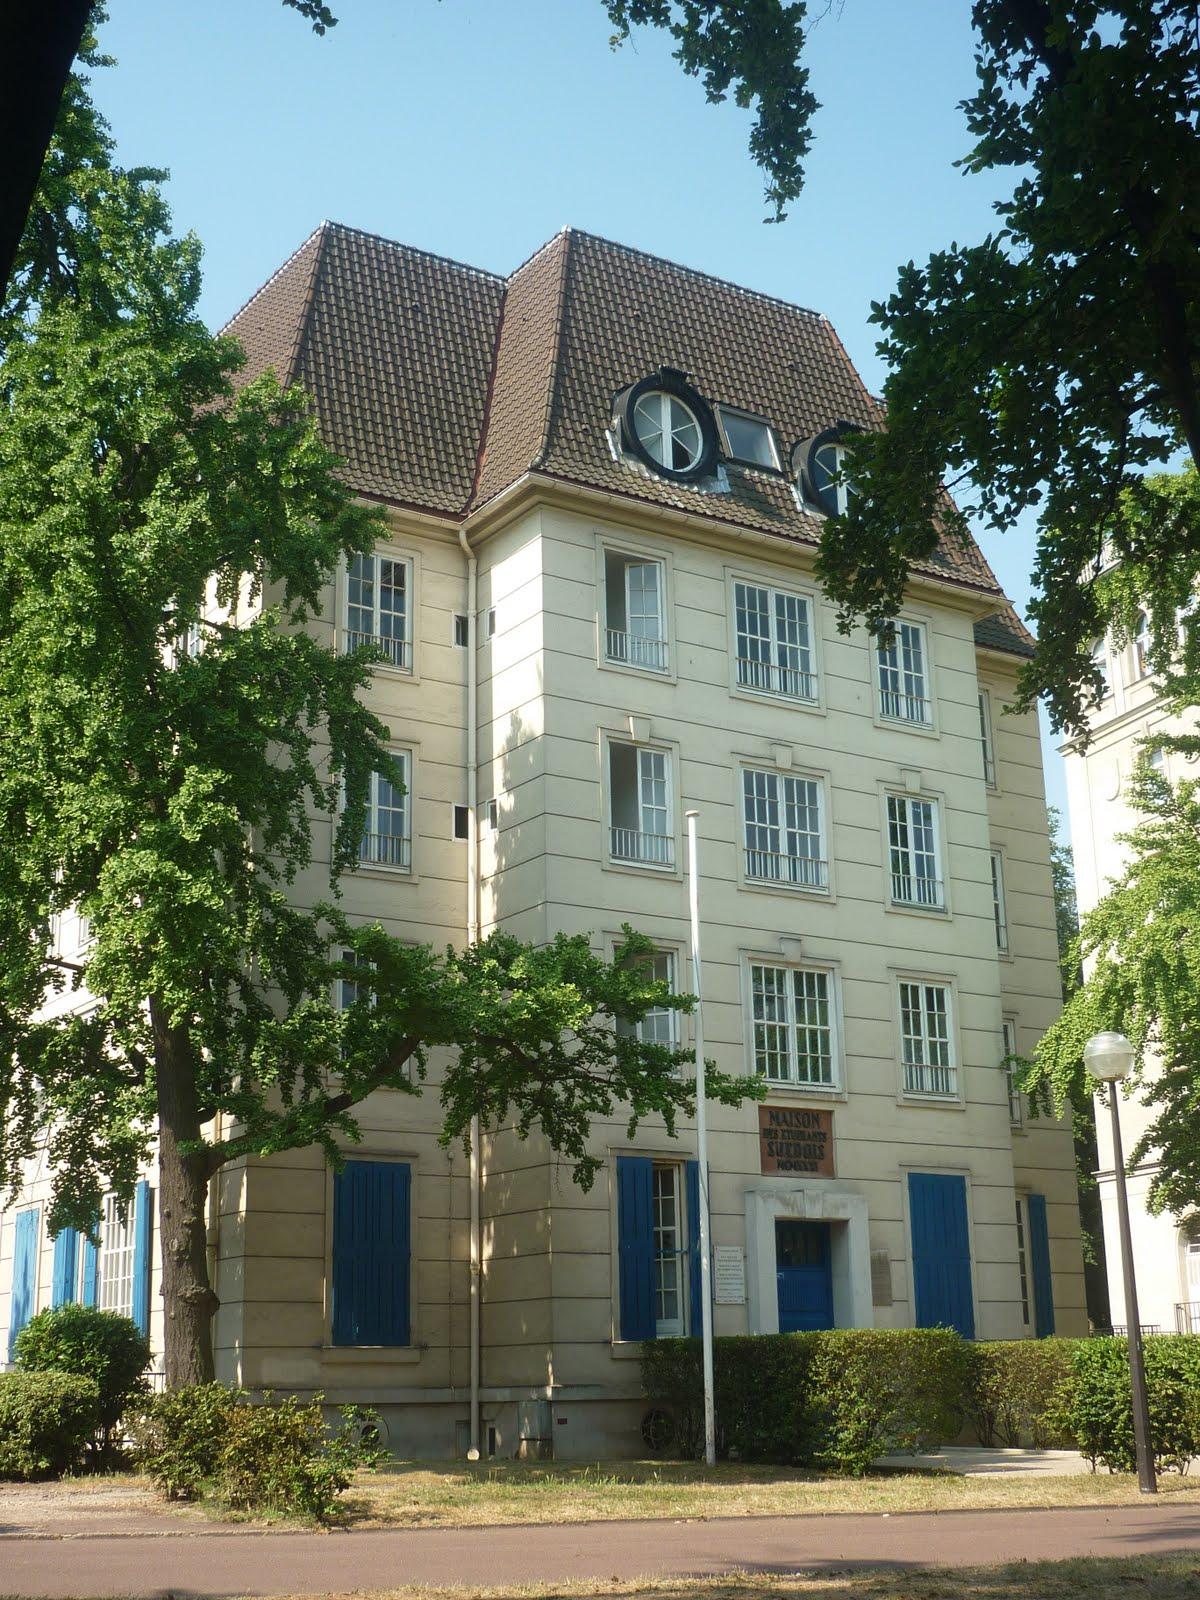 dr j j visite paris 14 me arrondissement. Black Bedroom Furniture Sets. Home Design Ideas